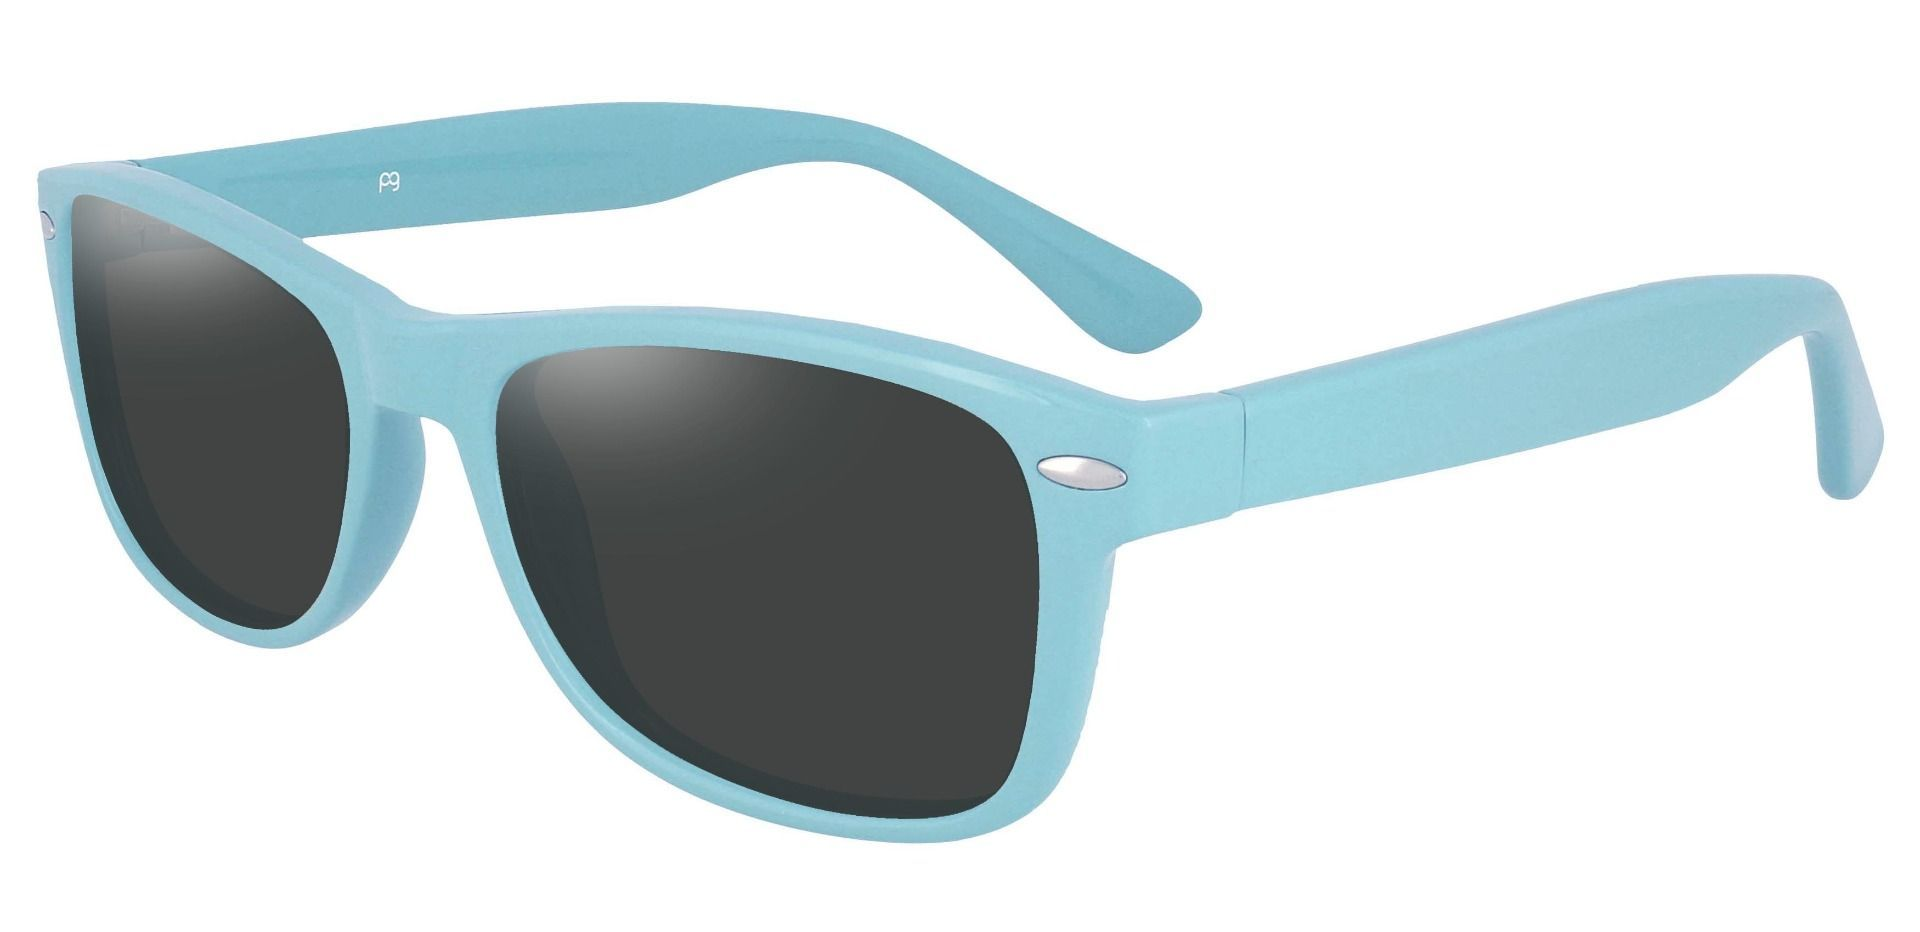 Kent Rectangle Prescription Sunglasses - Blue Frame With Gray Lenses